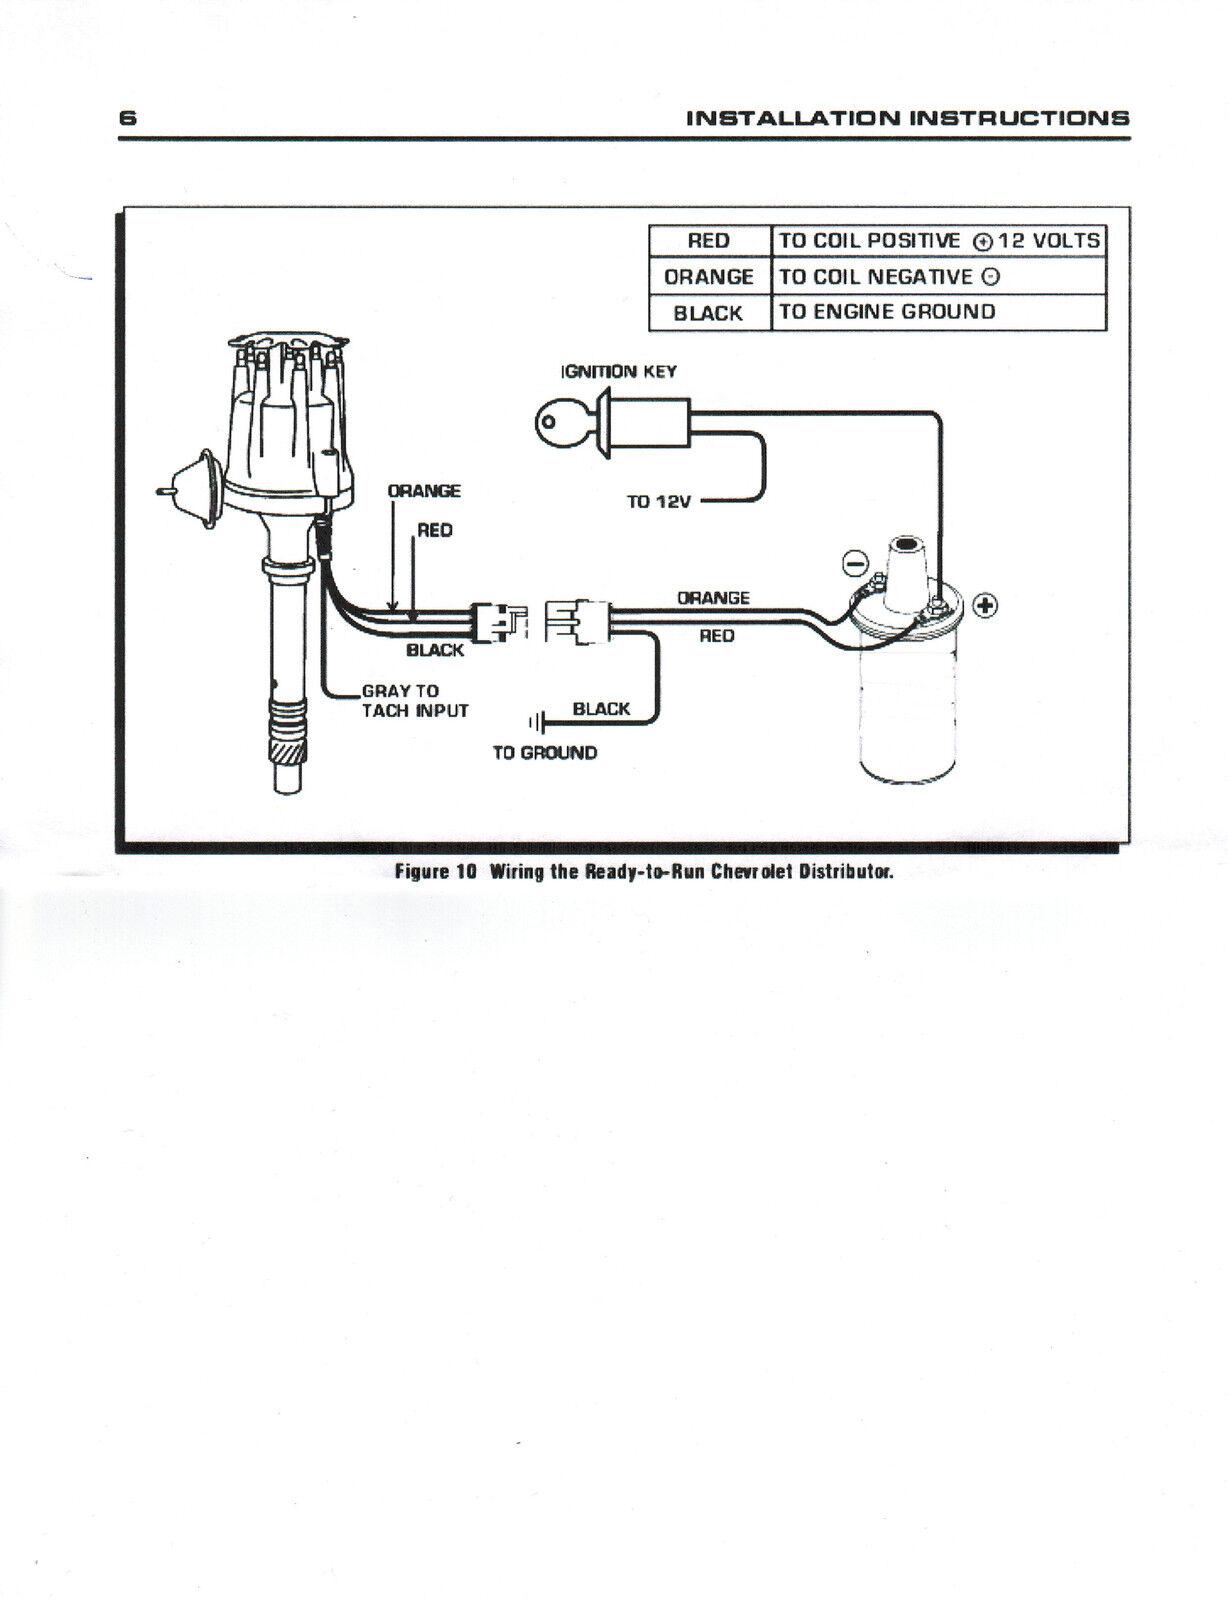 Chevy Distributor Wiring Diagram | online wiring diagram on 1974 chevy truck ignition diagram, chevy ignition switch diagram, chevrolet transmission diagram, chevrolet ignition switch, 89 corvette wiring diagram, chevrolet parking brake diagram, chevrolet battery diagram, chevrolet suspension diagram, chevrolet engine diagram, chevrolet a/c diagram, chevrolet fuse box diagram, 4 wire ignition switch diagram, chevrolet wiring harness, chevrolet exhaust diagram,